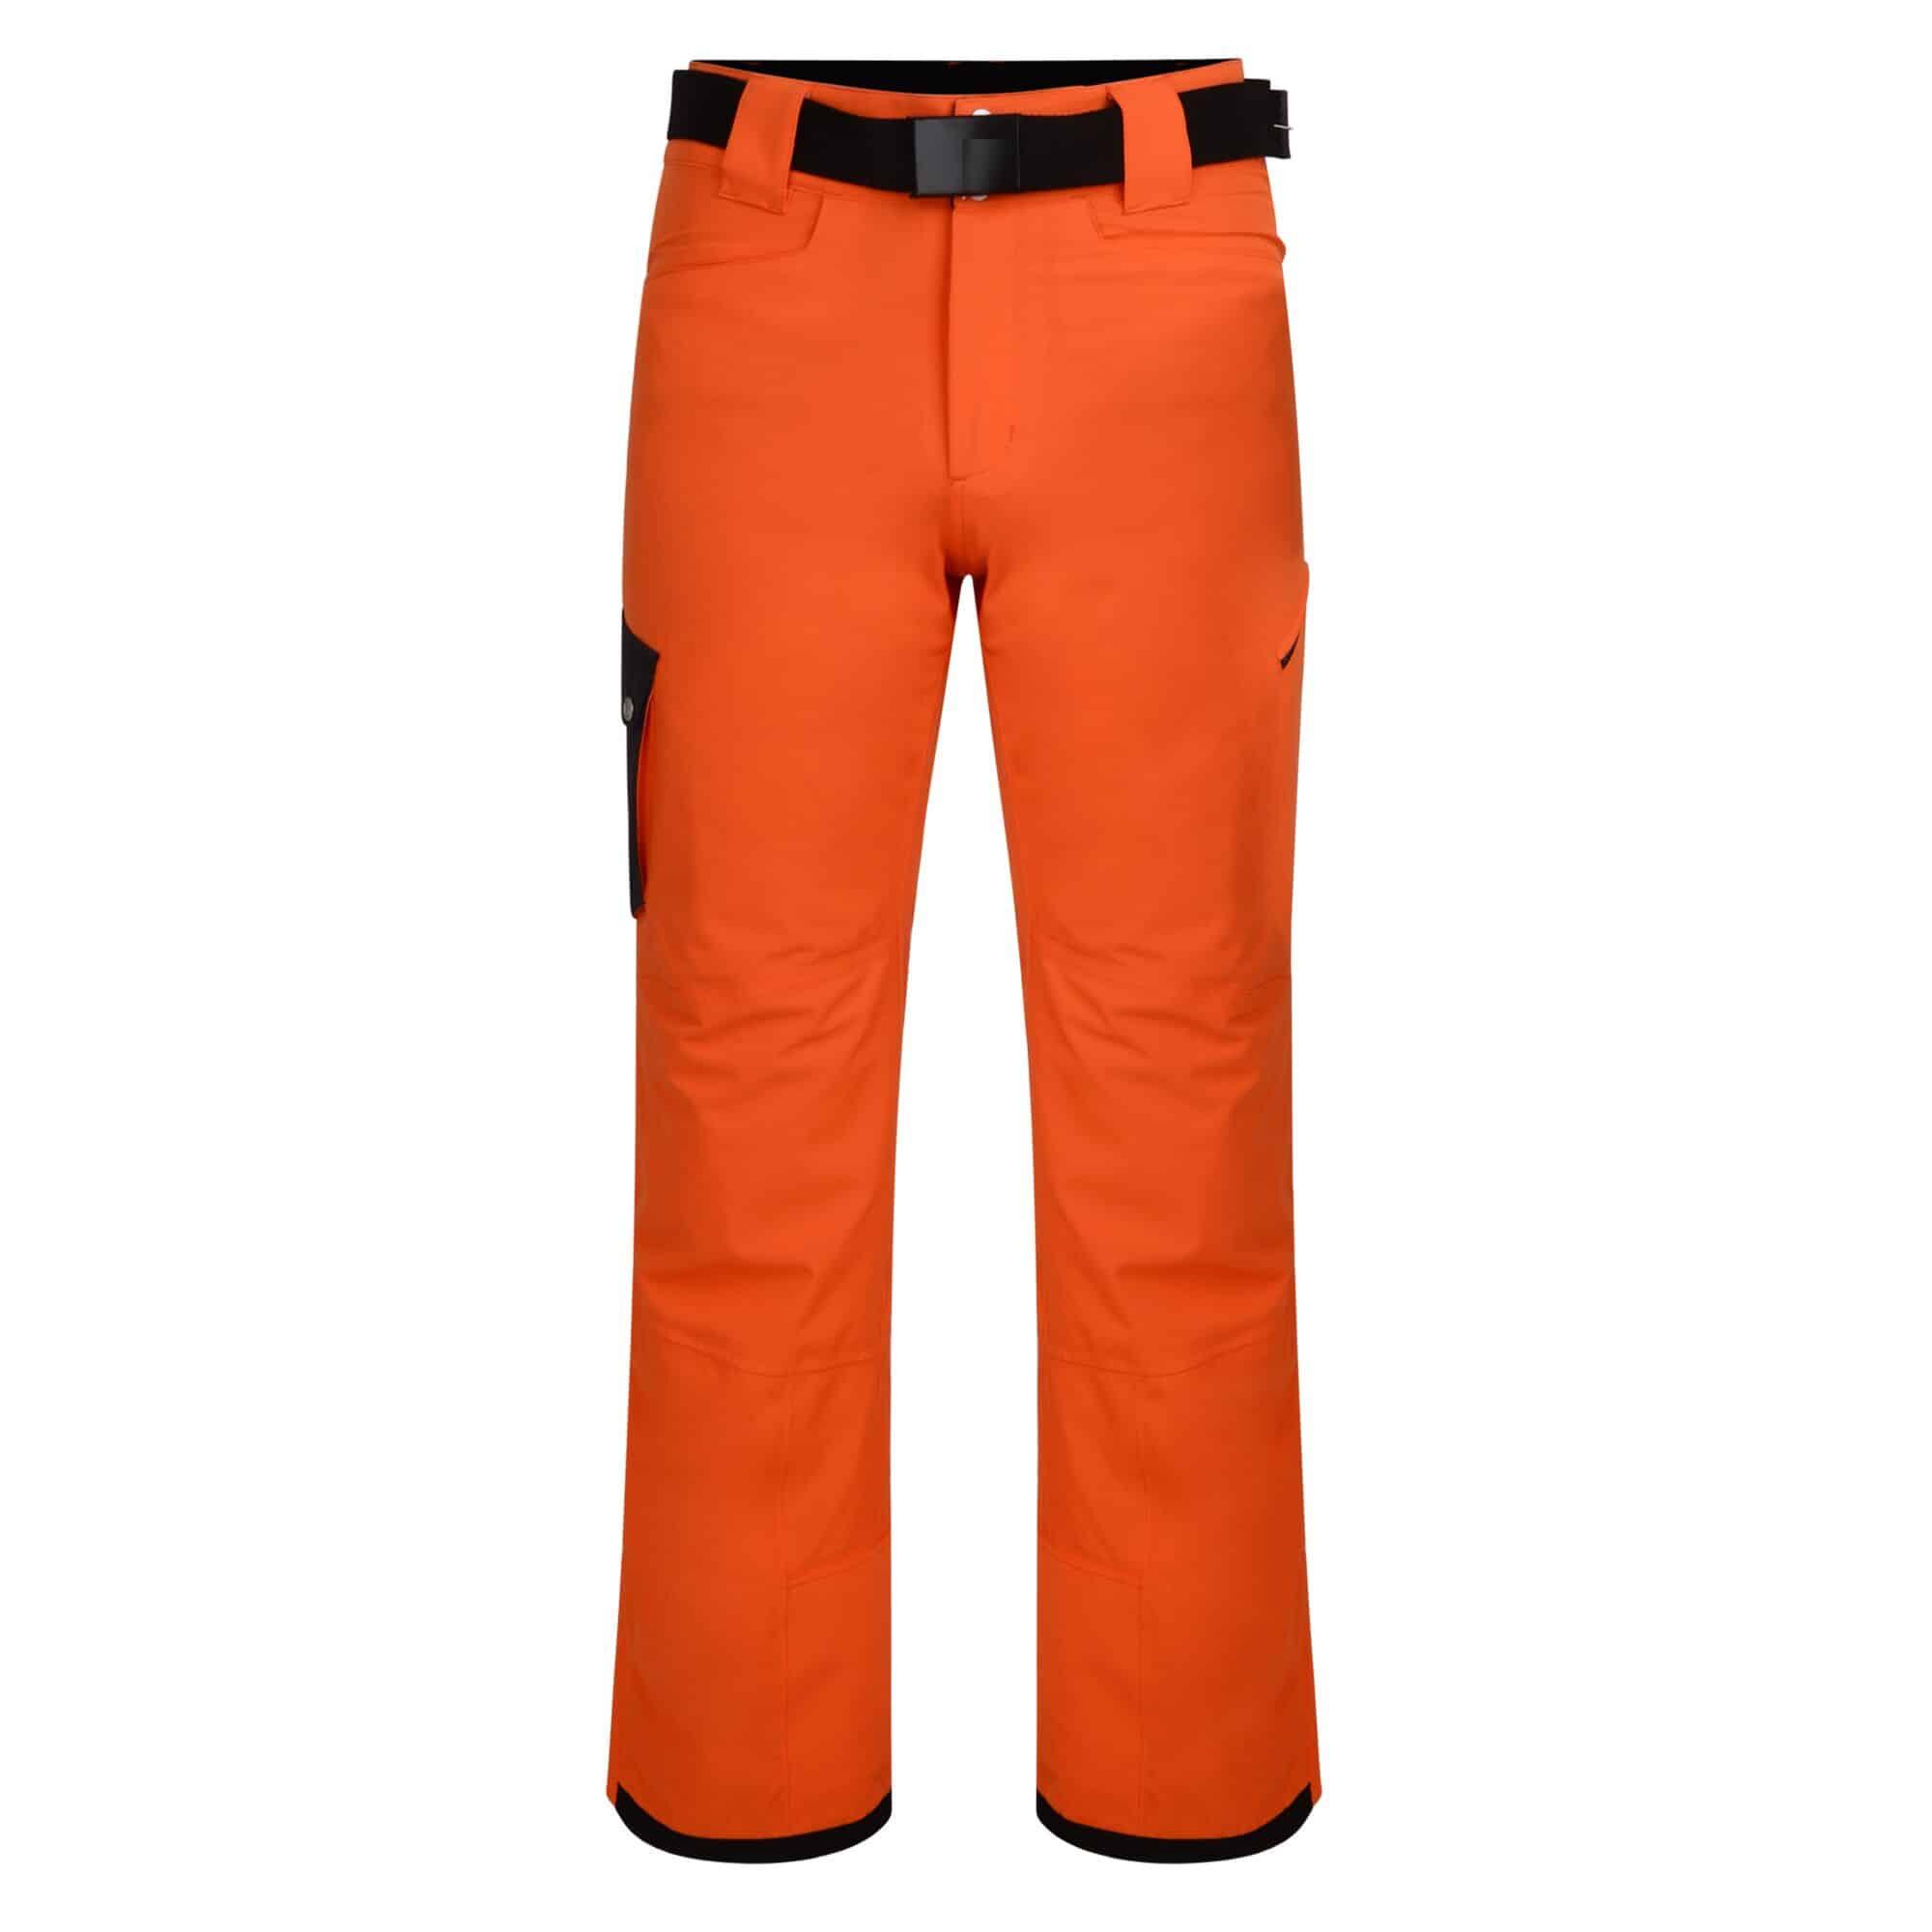 absolute orange front dmw462 4L7